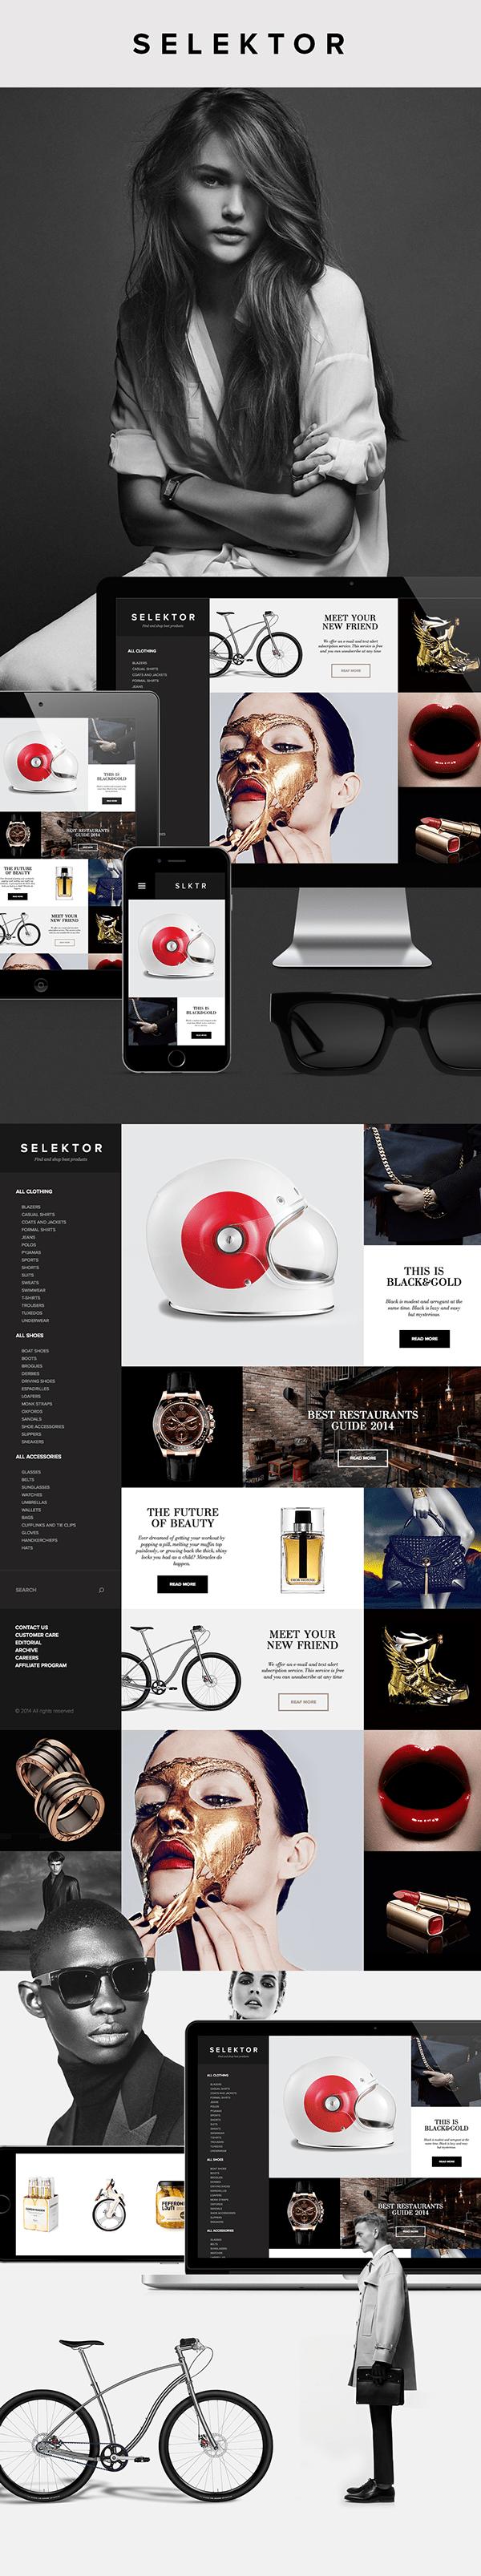 SLKTR – Social shopping platform design by Serge Vasil